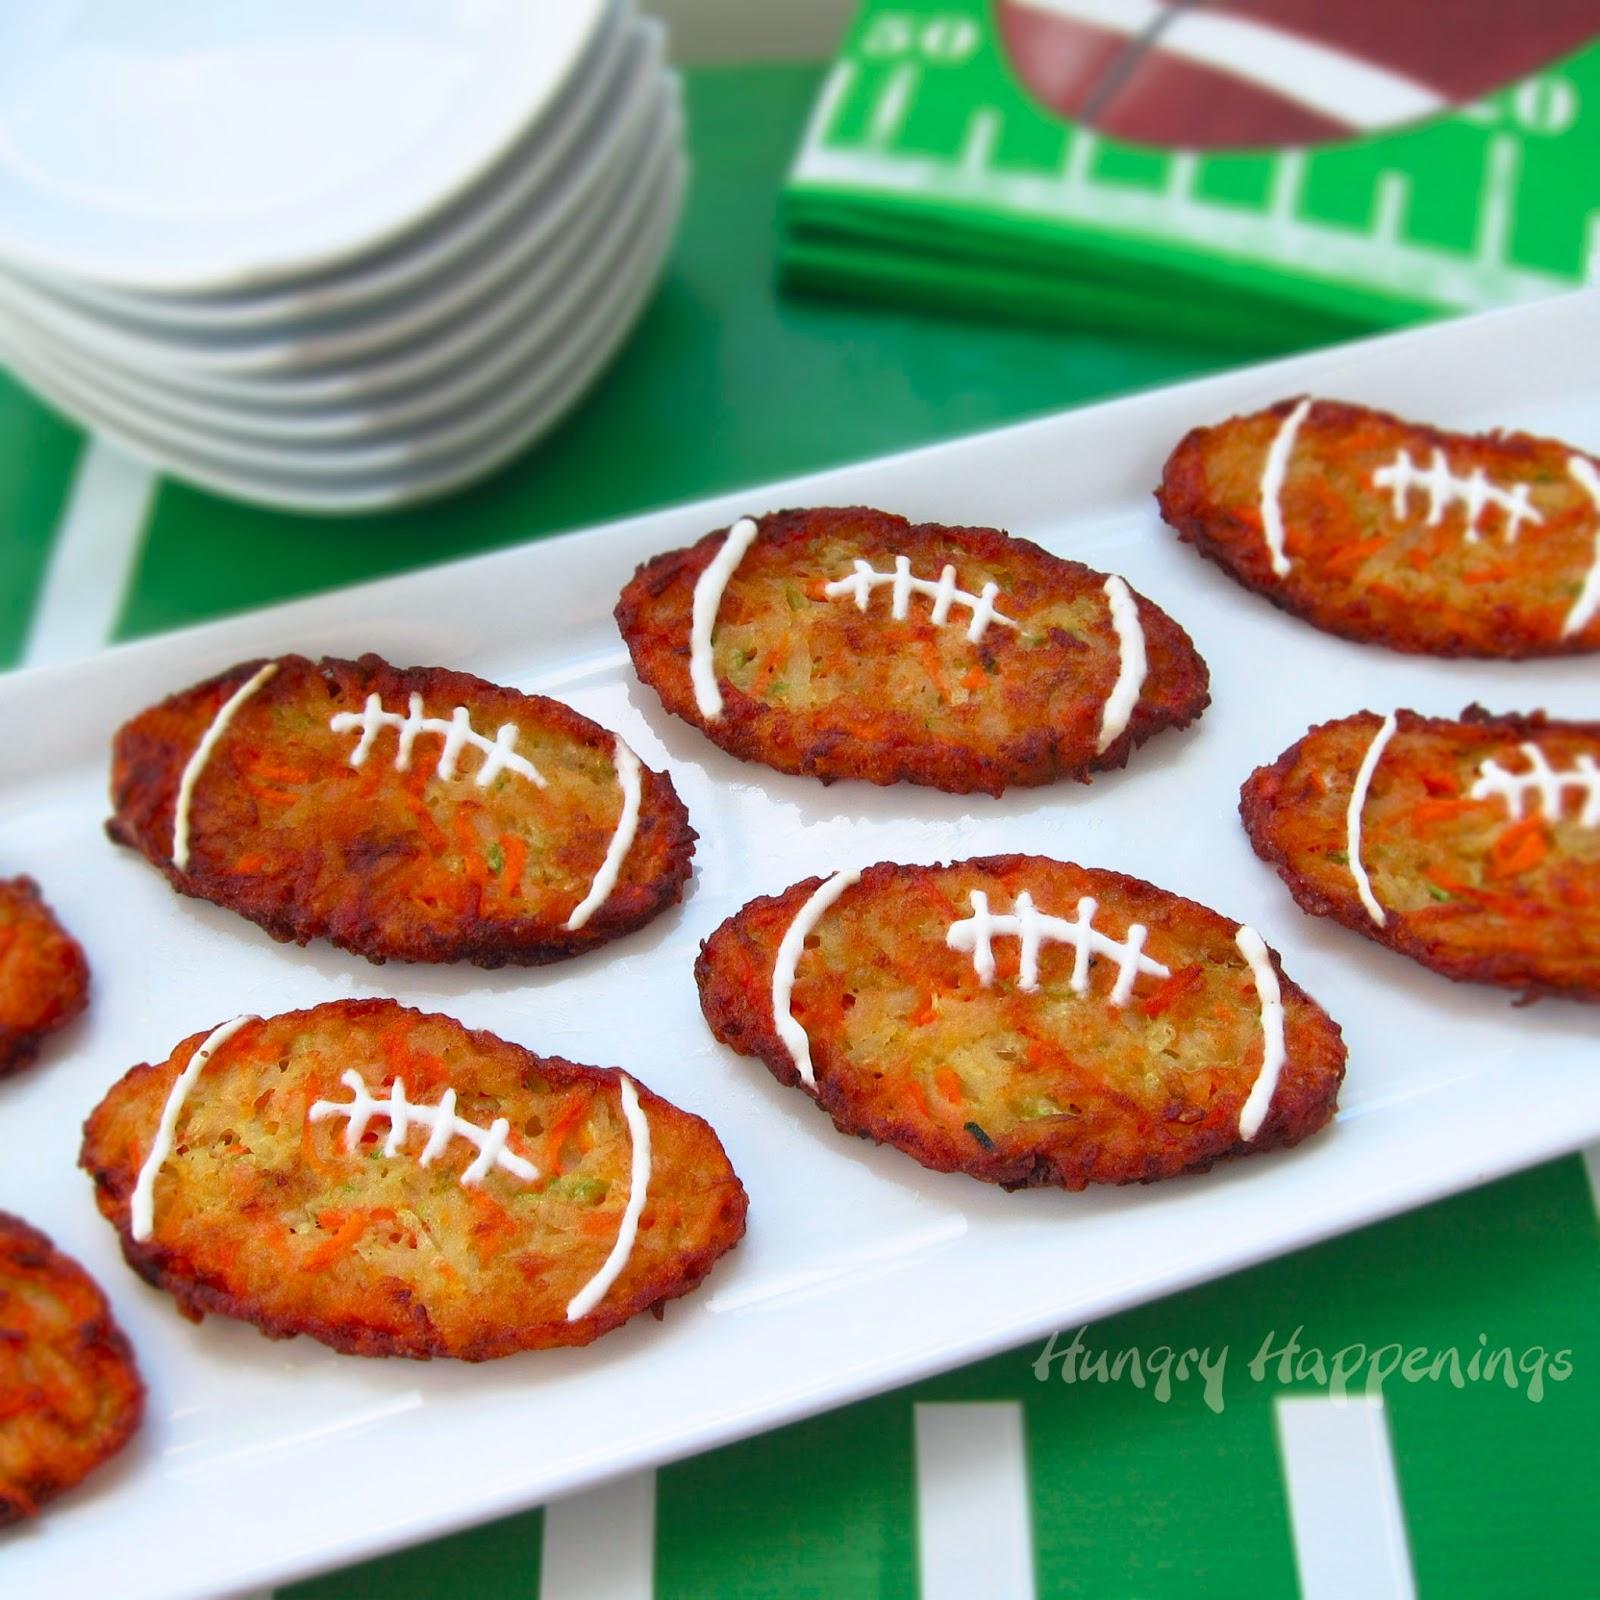 Super Bowl Sunday? Perhaps it's the proliferation of Super Bowl snacks ...